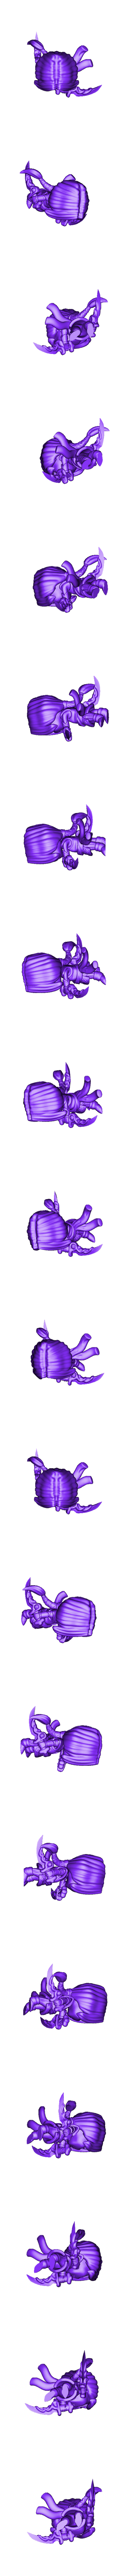 Hawk_Without_Base.stl Download free STL file Chibi Hawk | Trials of Mana (Seiken Densetsu) • 3D print template, HyperMiniatures